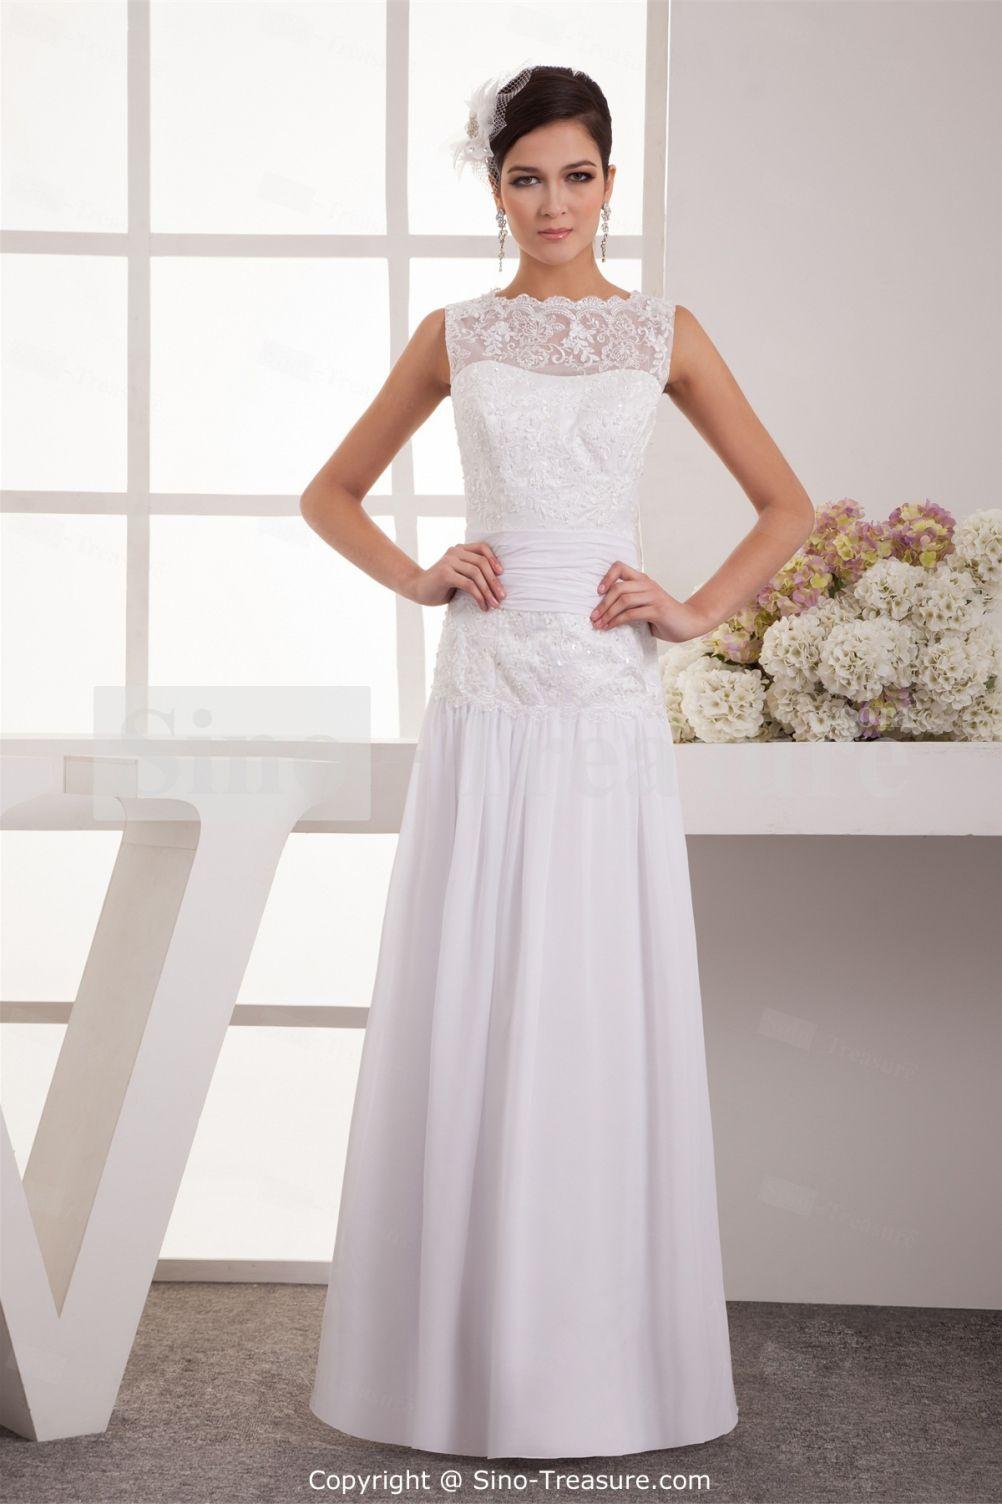 Wedding dresses atlanta ga dressy dresses for weddings check more